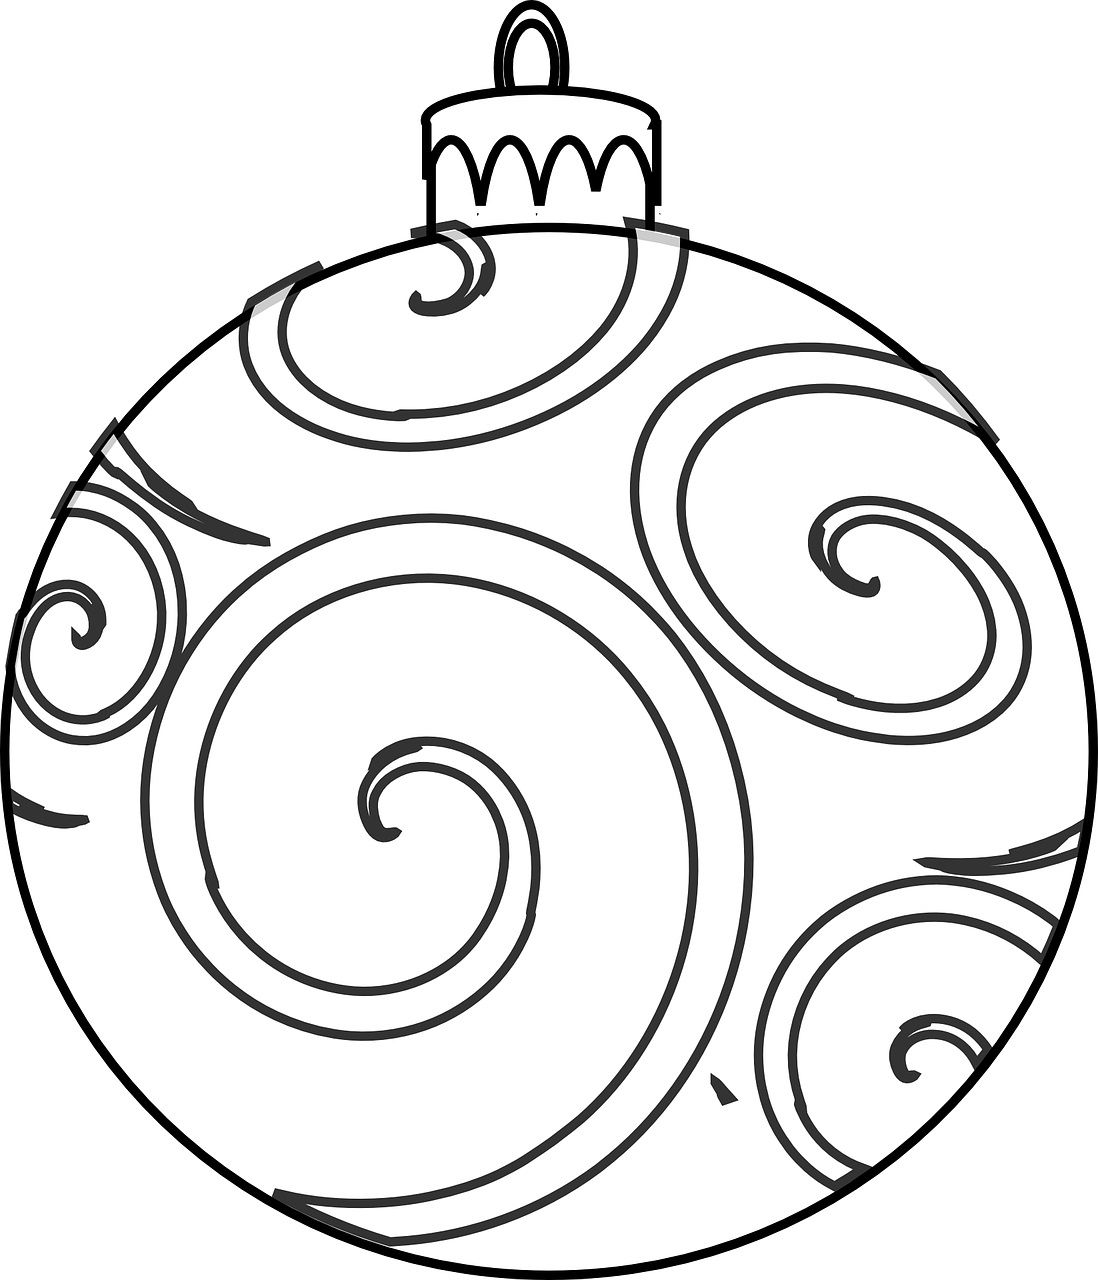 000 Magnificent Printable Christma Ornament Template Highest Quality  Templates Stencil Felt Pattern TreeFull